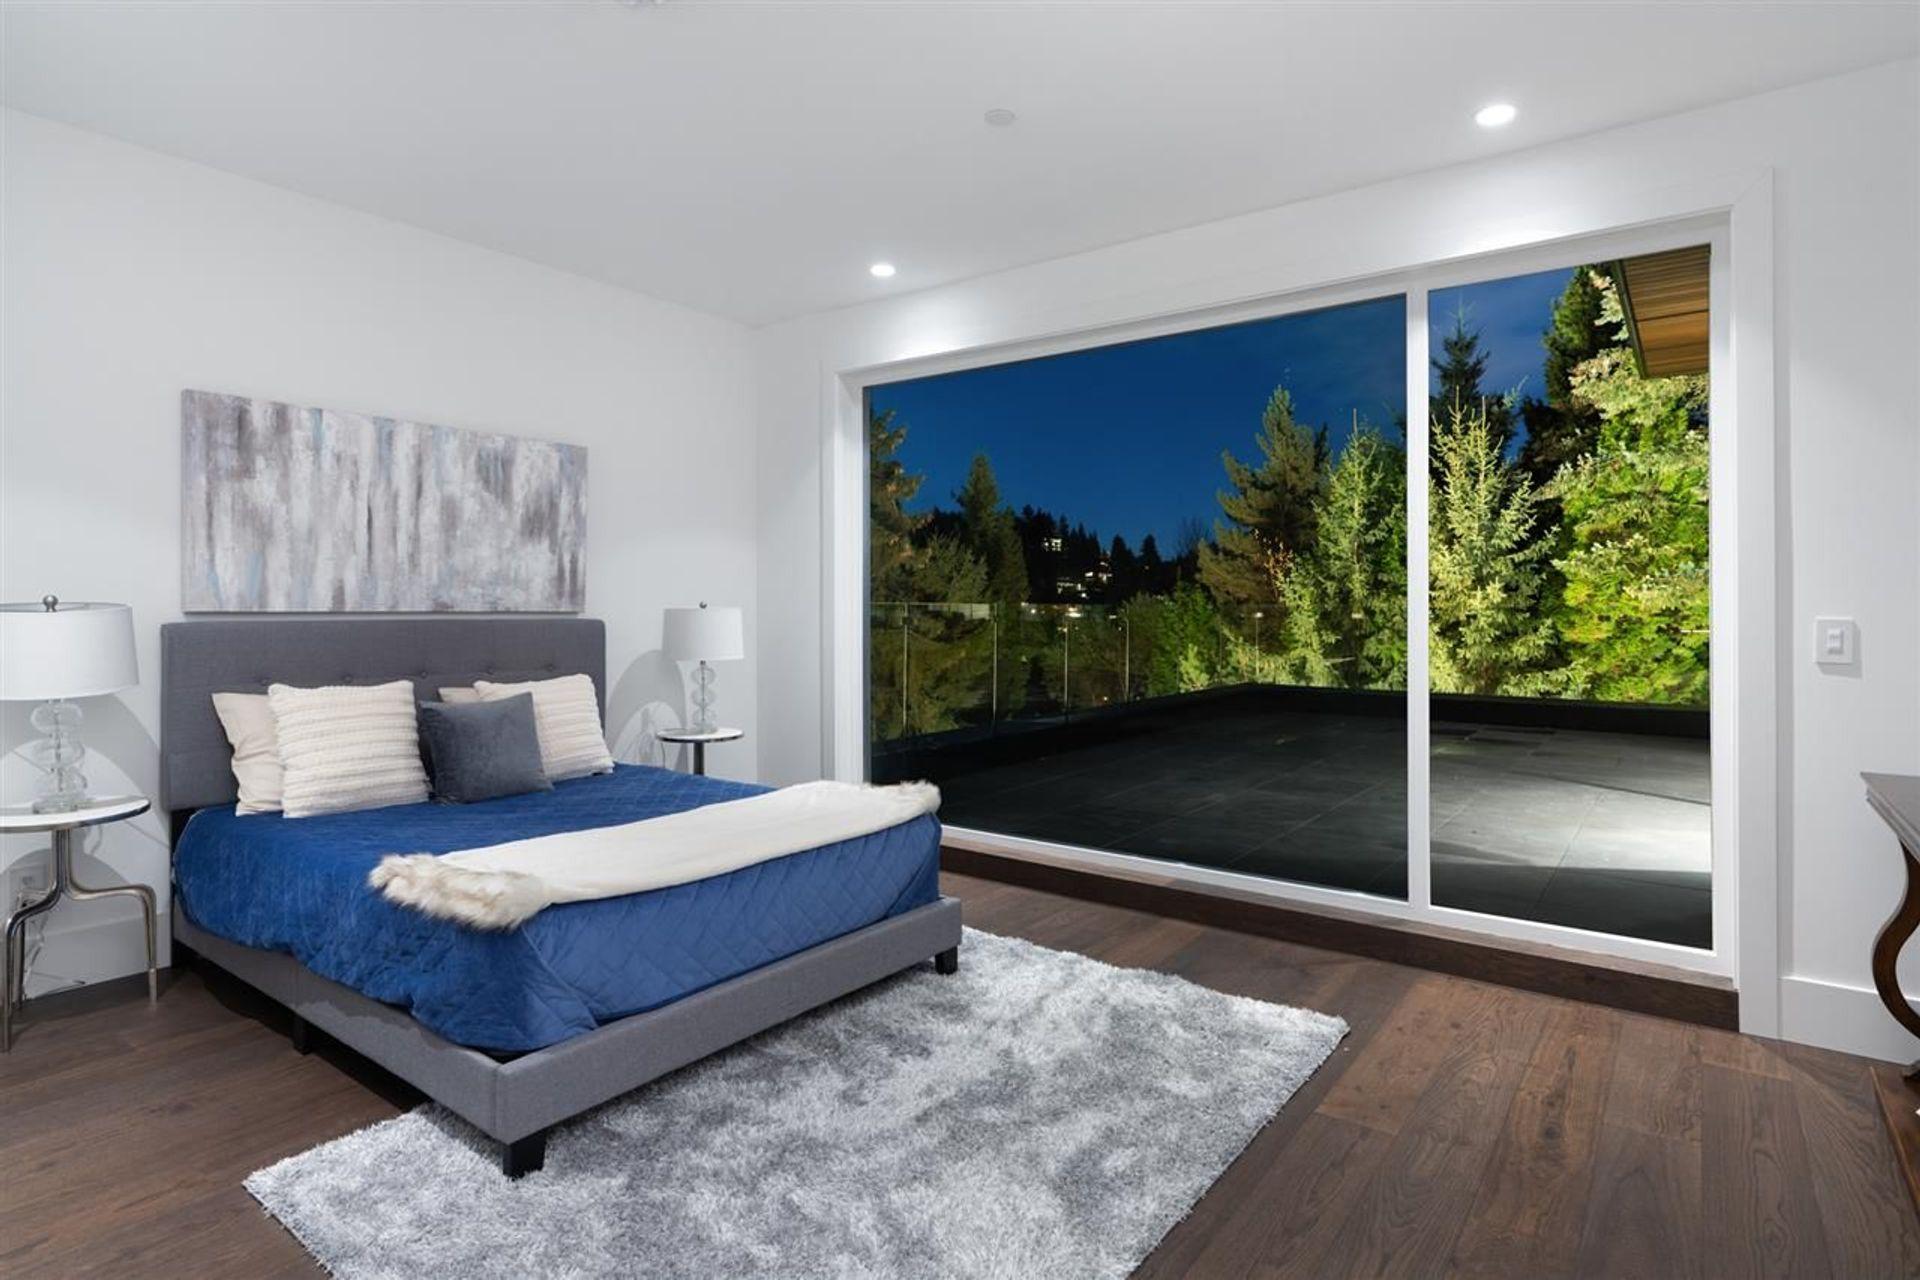 1040-wildwood-lane-british-properties-west-vancouver-14 at 1040 Wildwood Lane, British Properties, West Vancouver